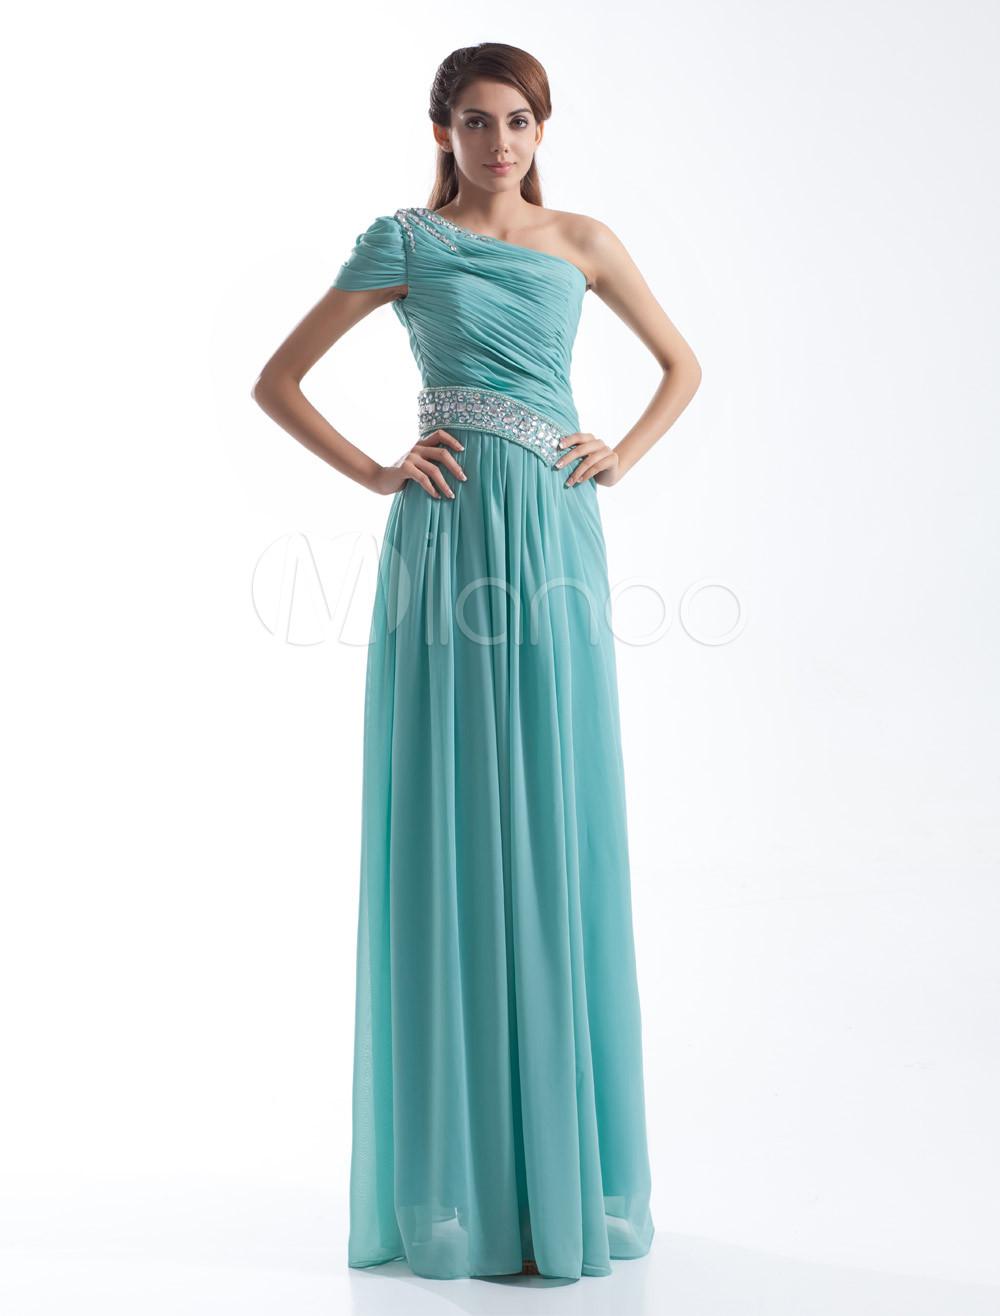 Chiffon Prom Dress Turquoise One Shoulder Formal Dress Rhinestones Beading Floor Length Evening Dress